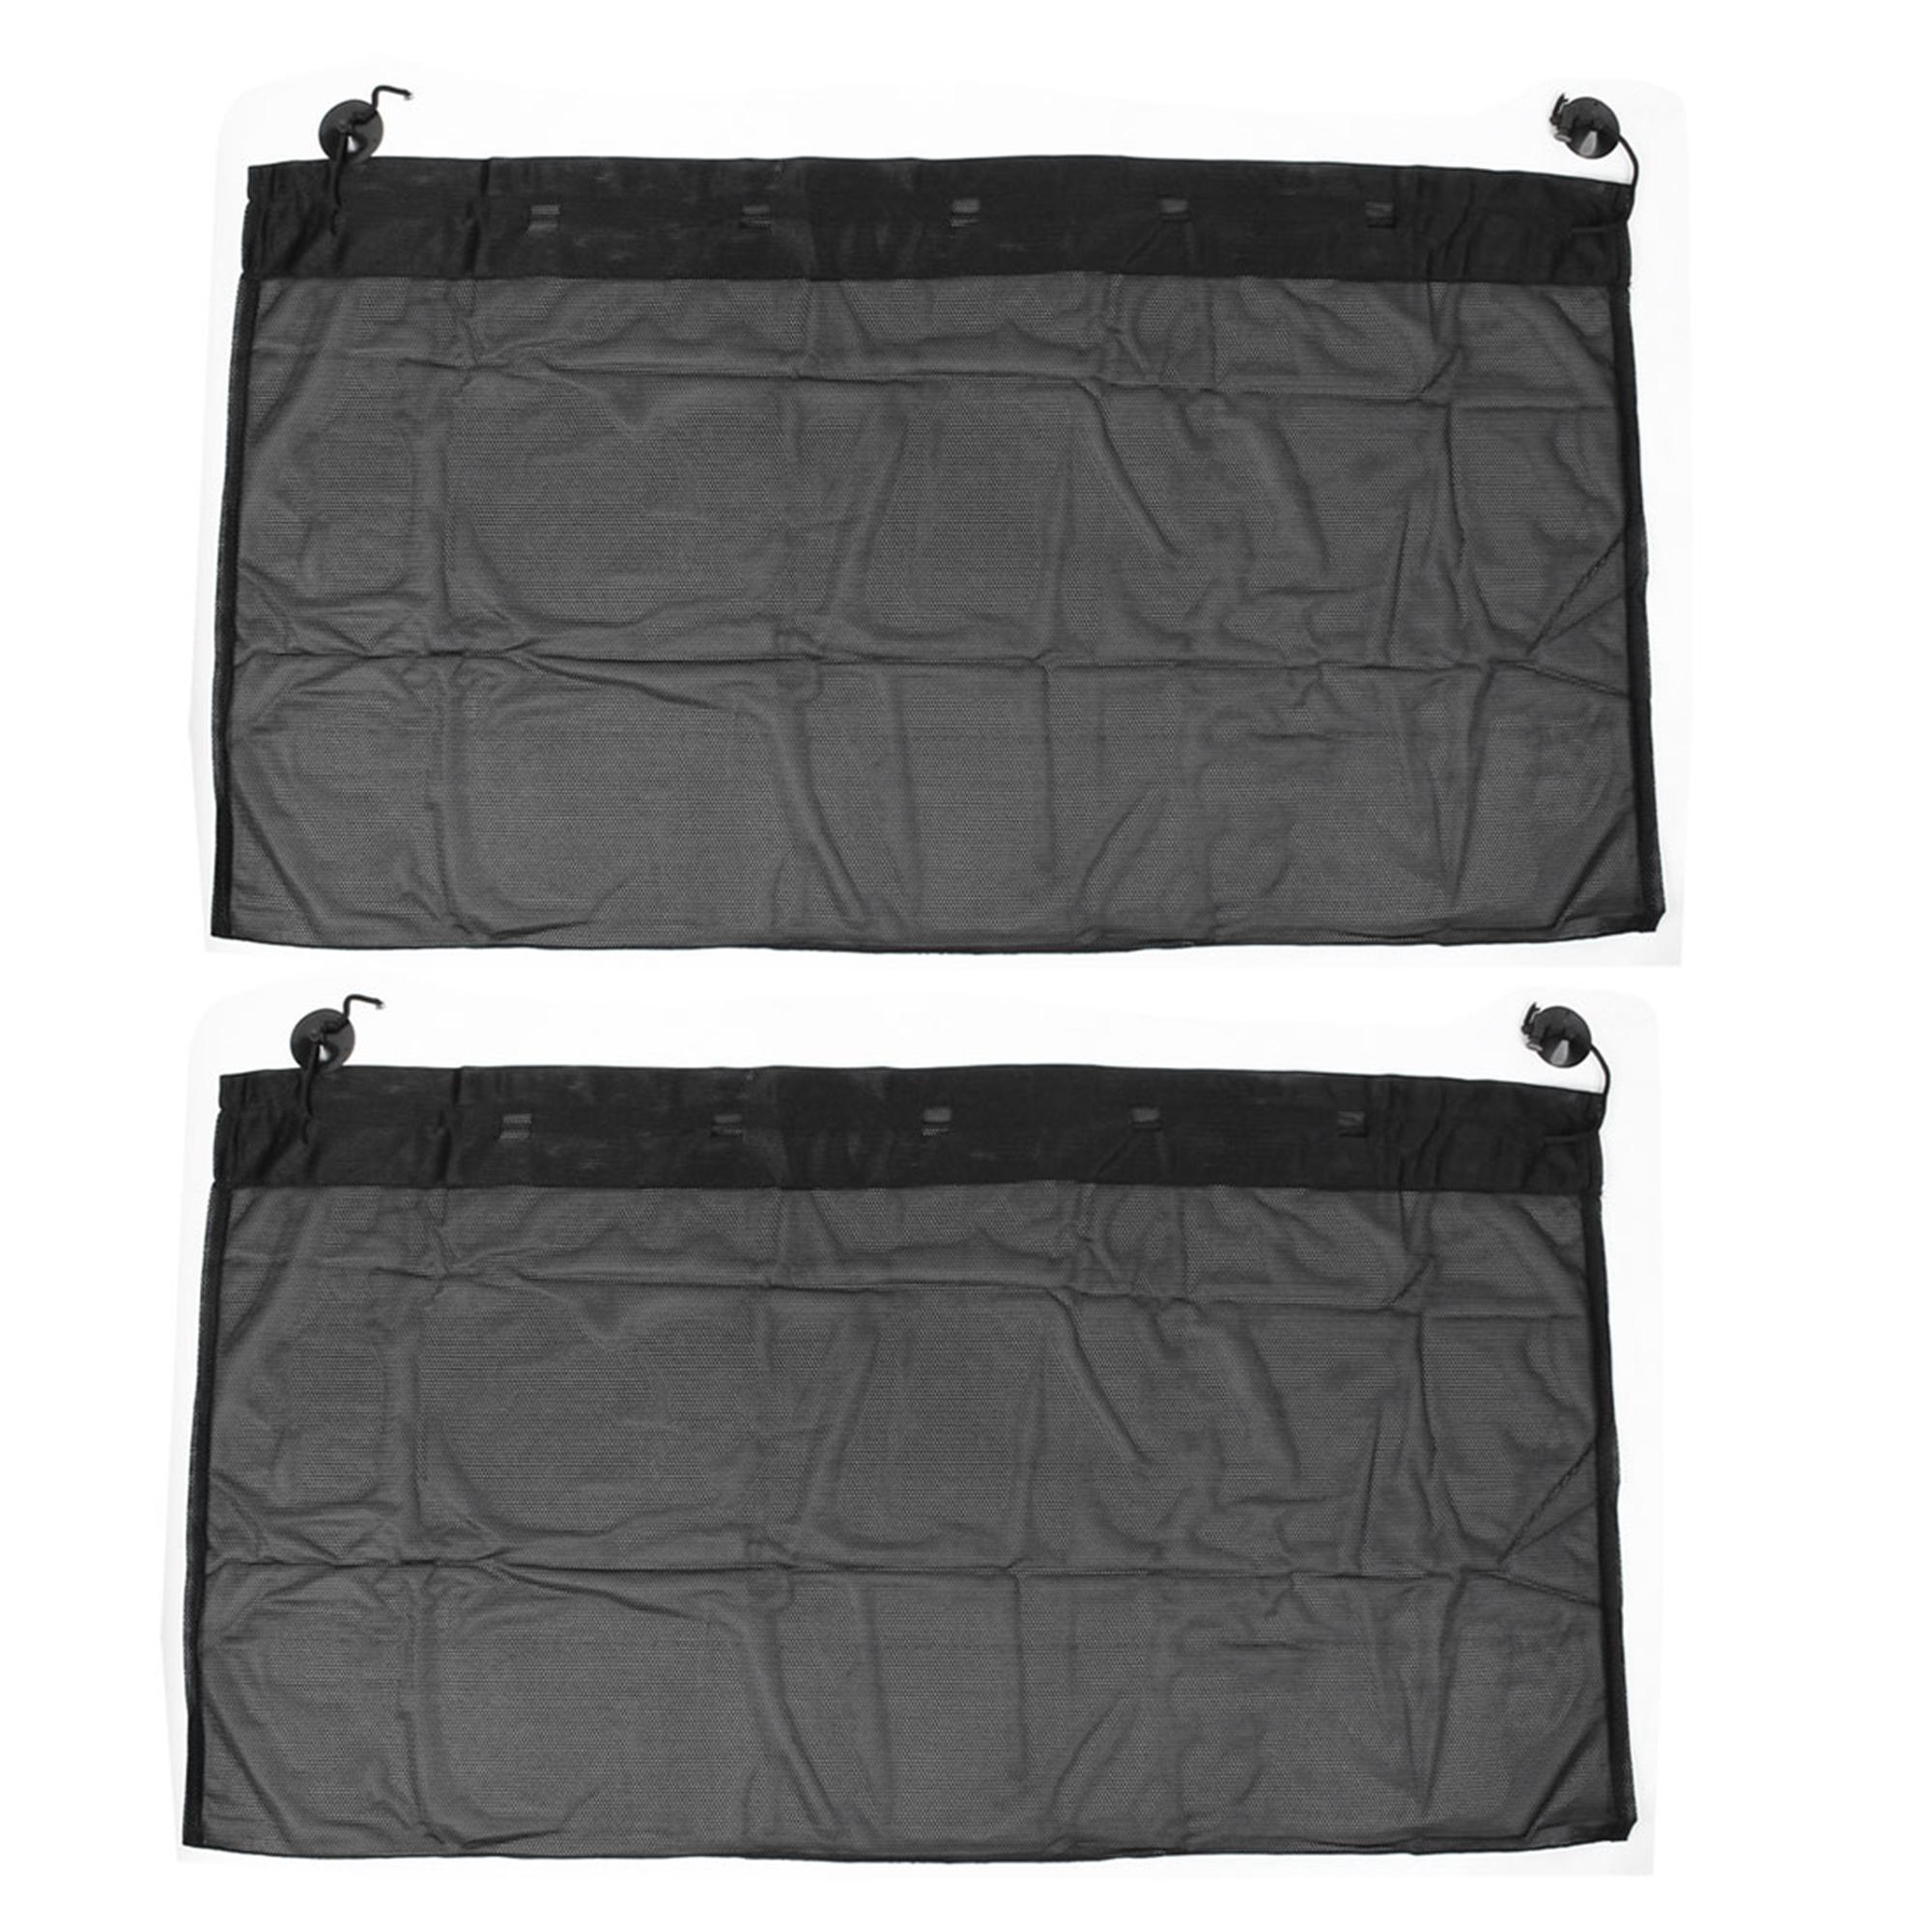 2 Pcs 100cm x 50cm Auto Car Window Side Folding Sun Shade Black Mesh